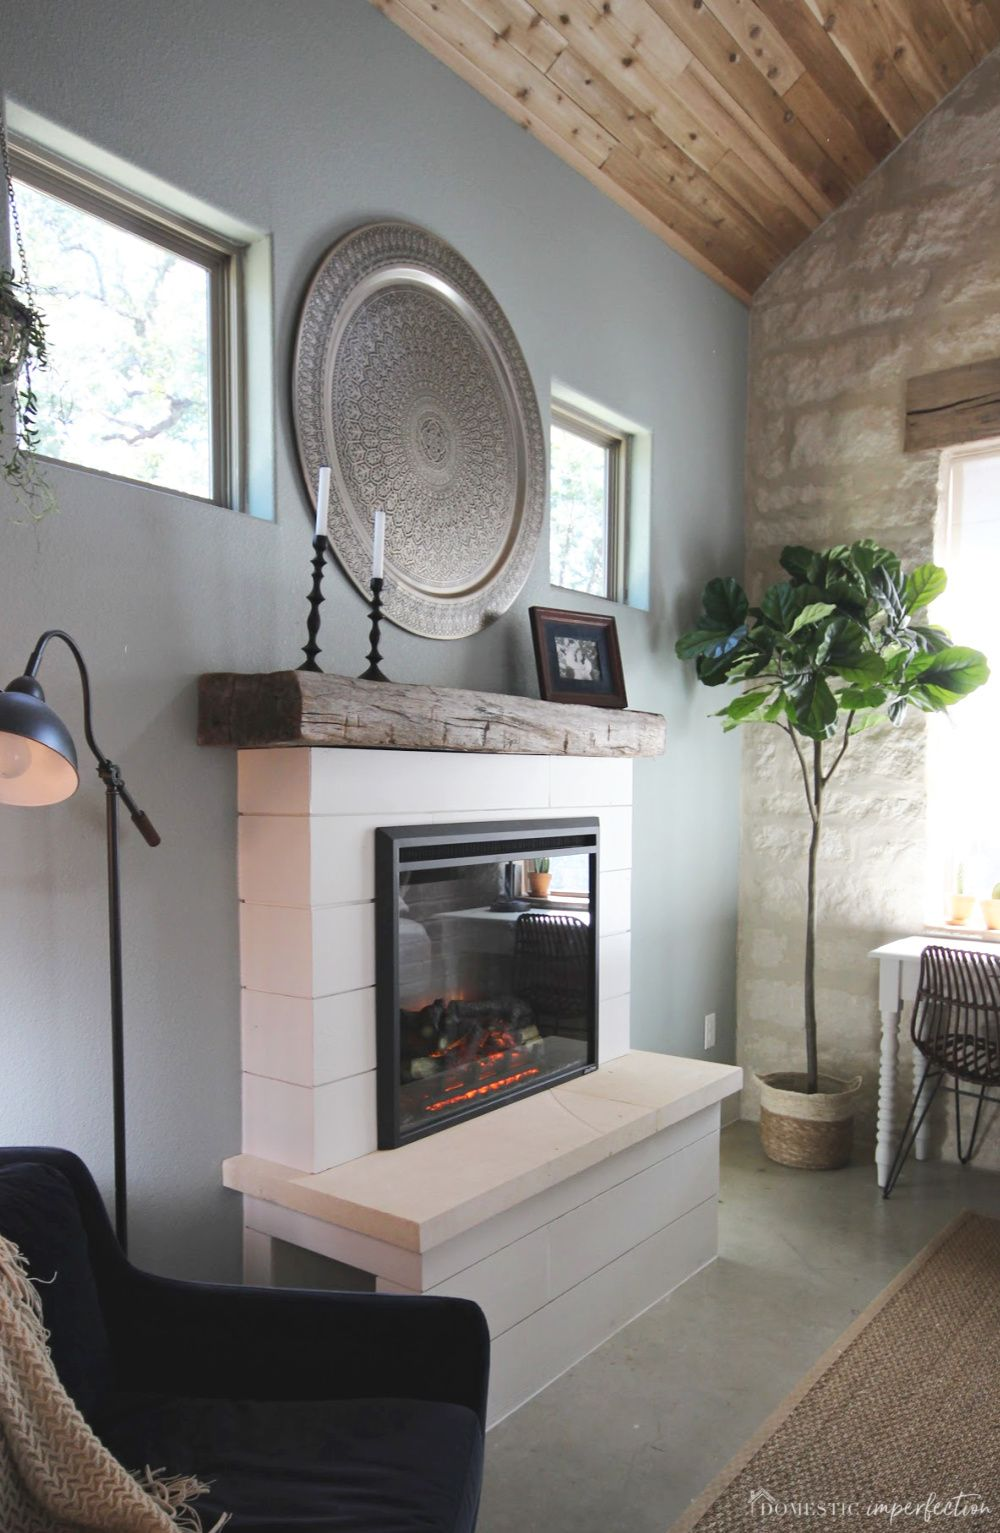 DIY Electric Fireplace Diy fireplace, Electric fireplace